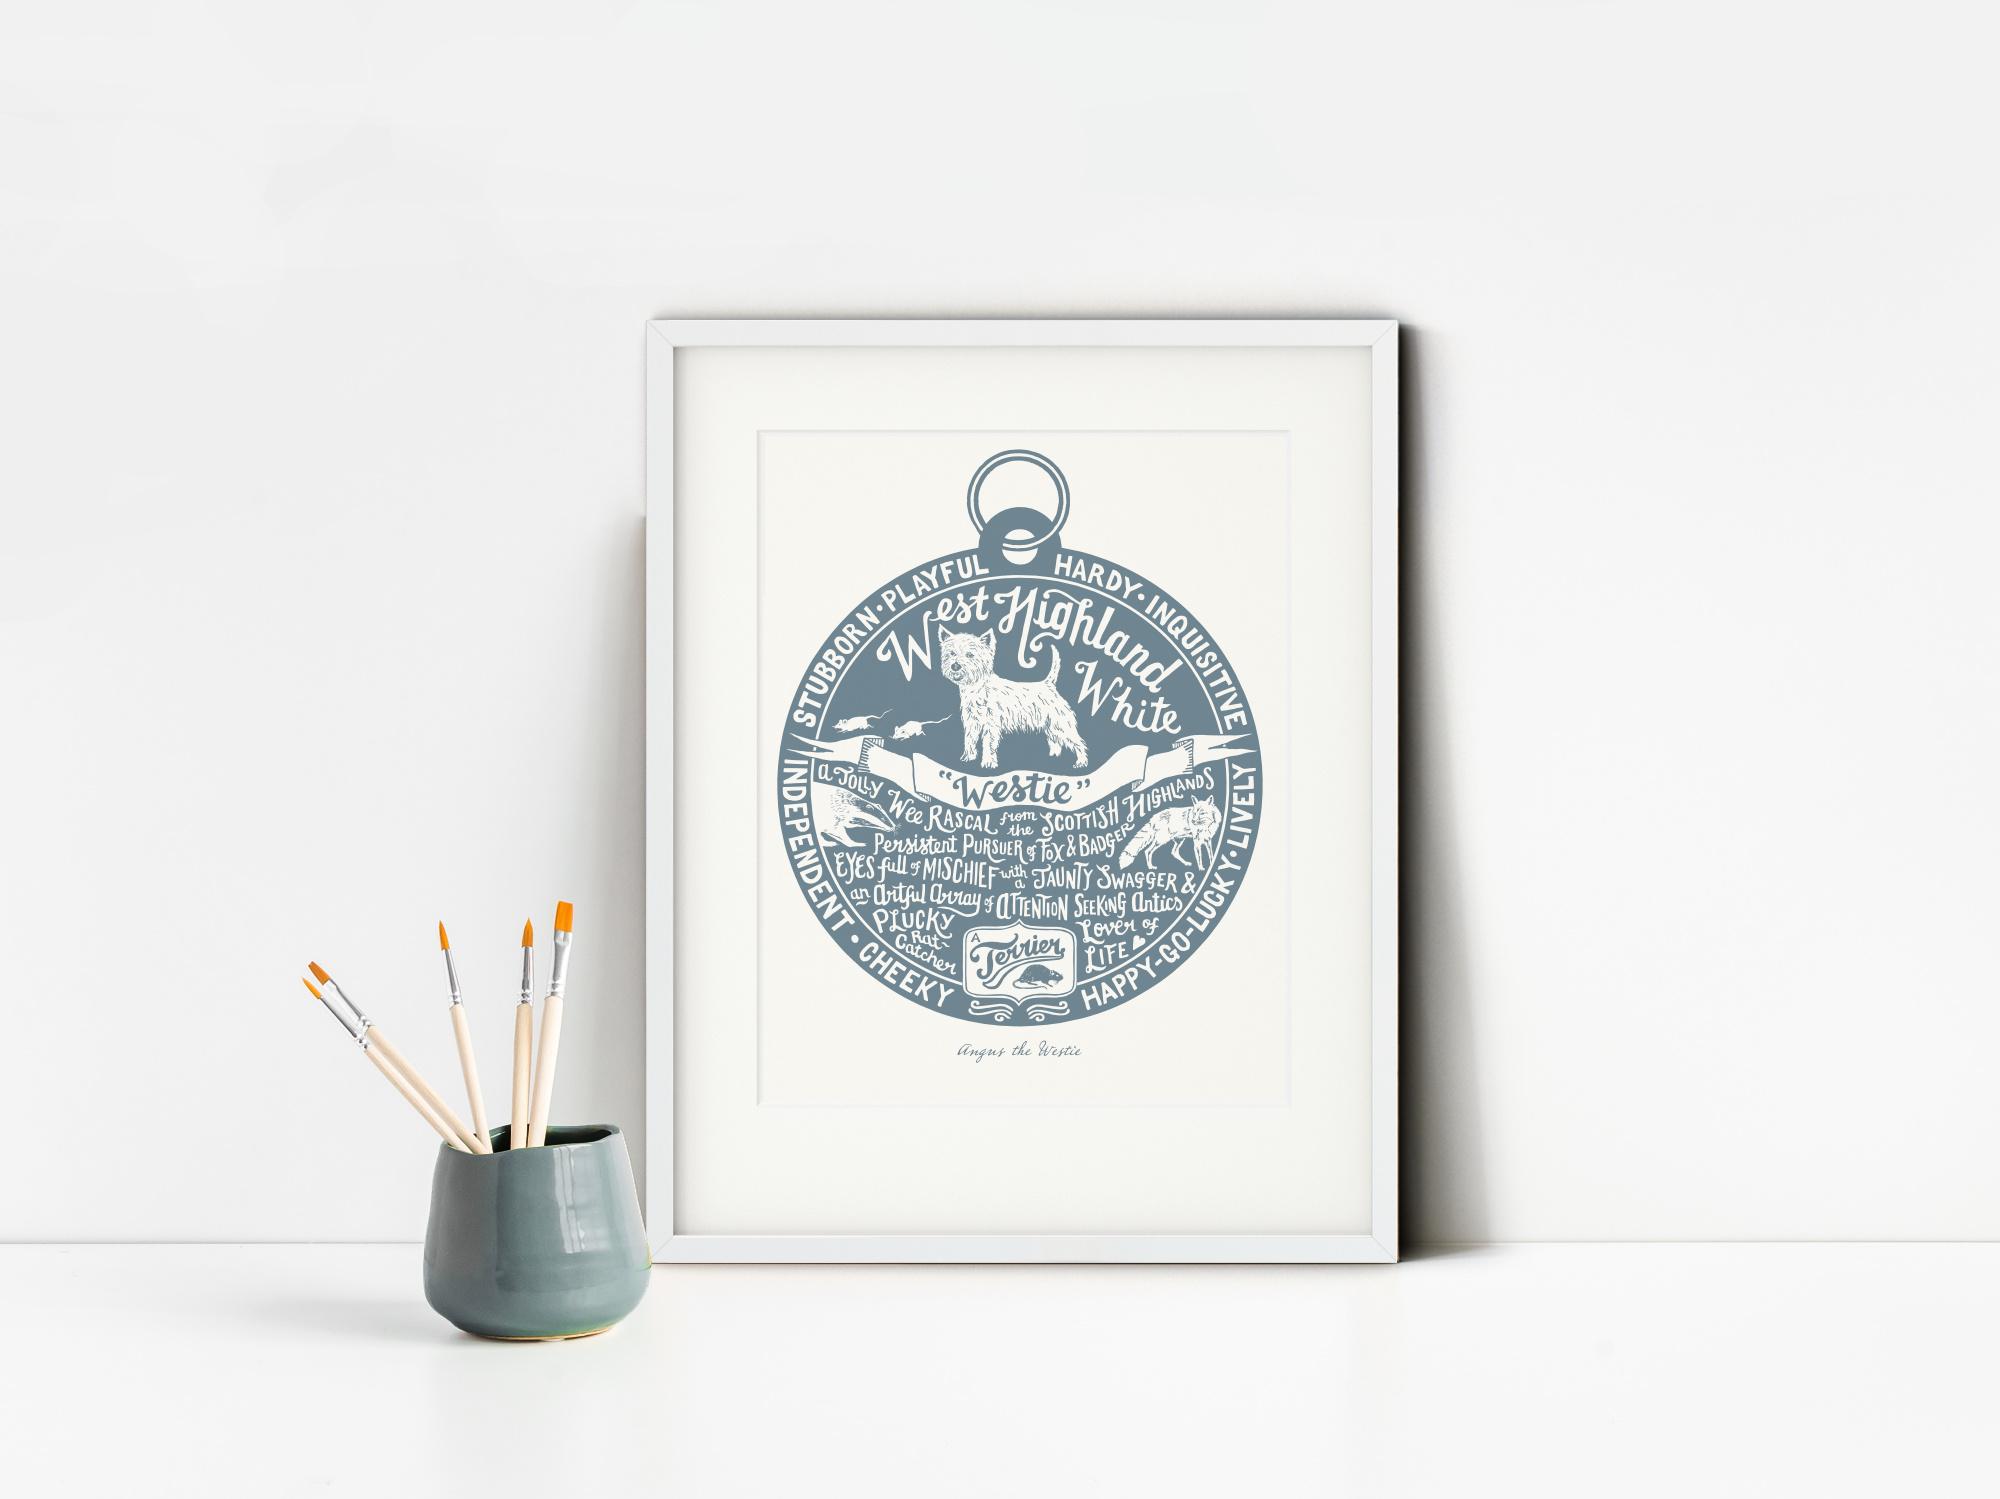 West Highland White Terrier Art Print | The Enlightened Hound